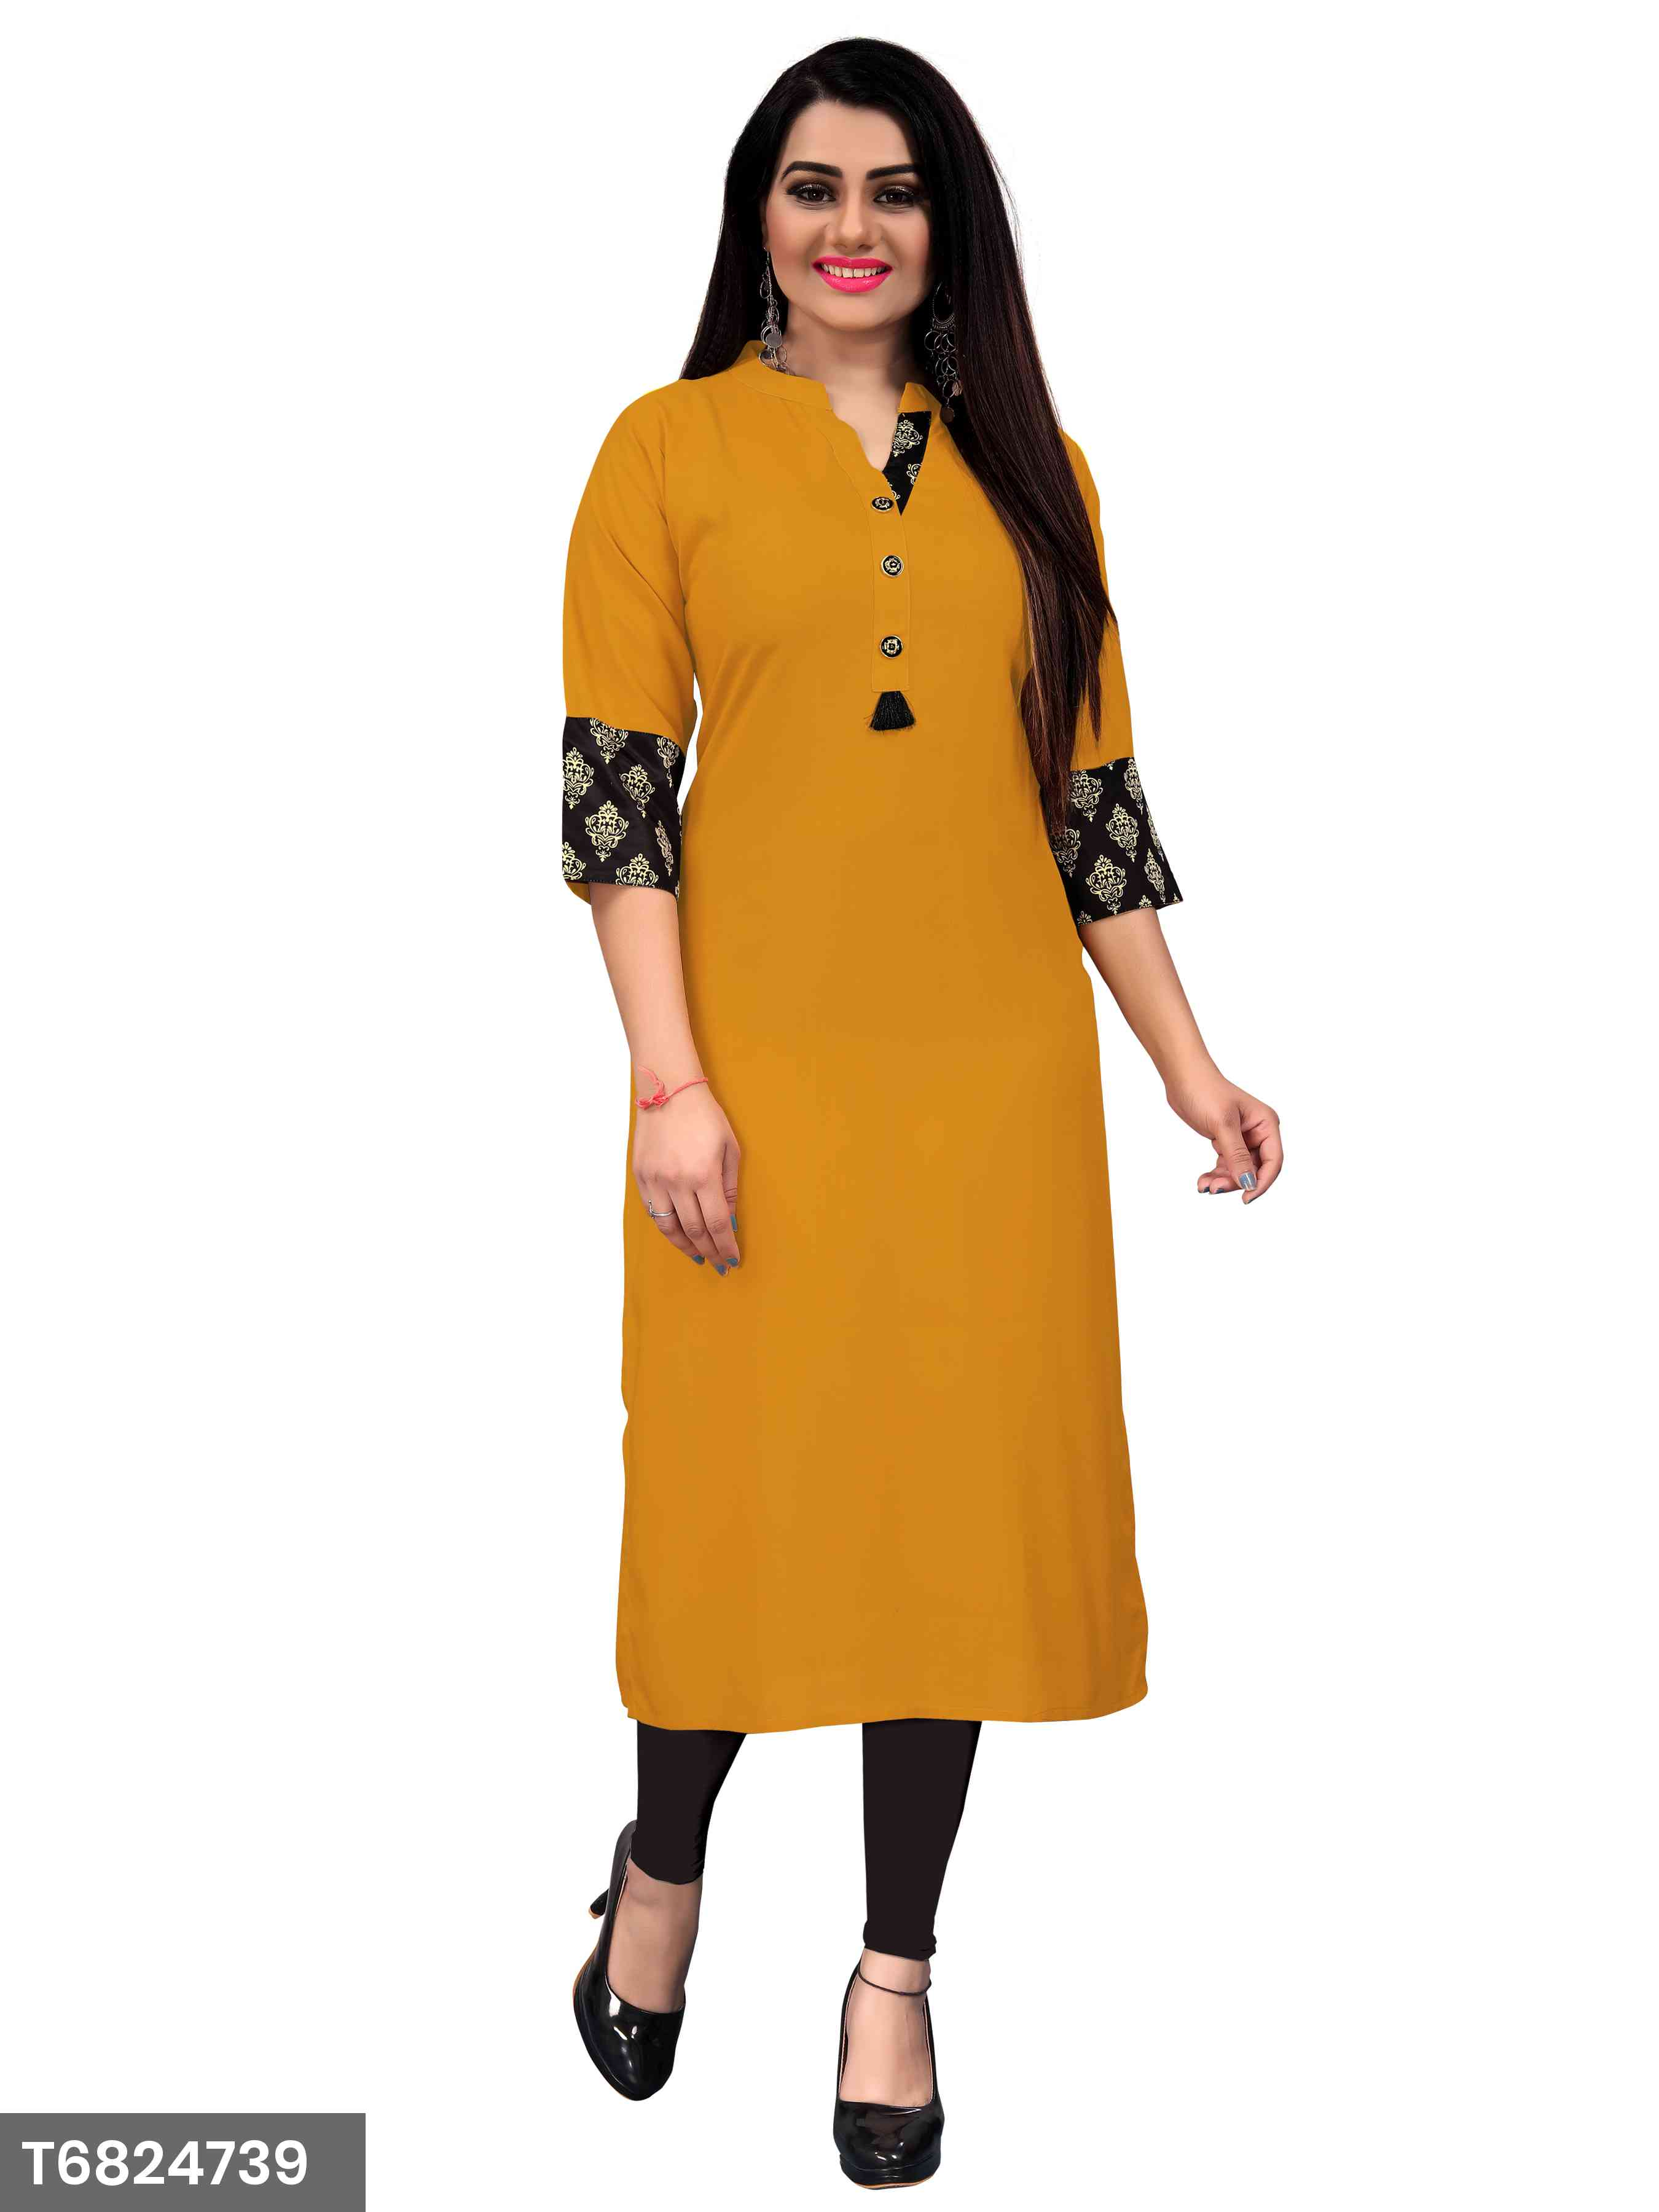 New Plain Yellow Color Rayon Kurti For Women's